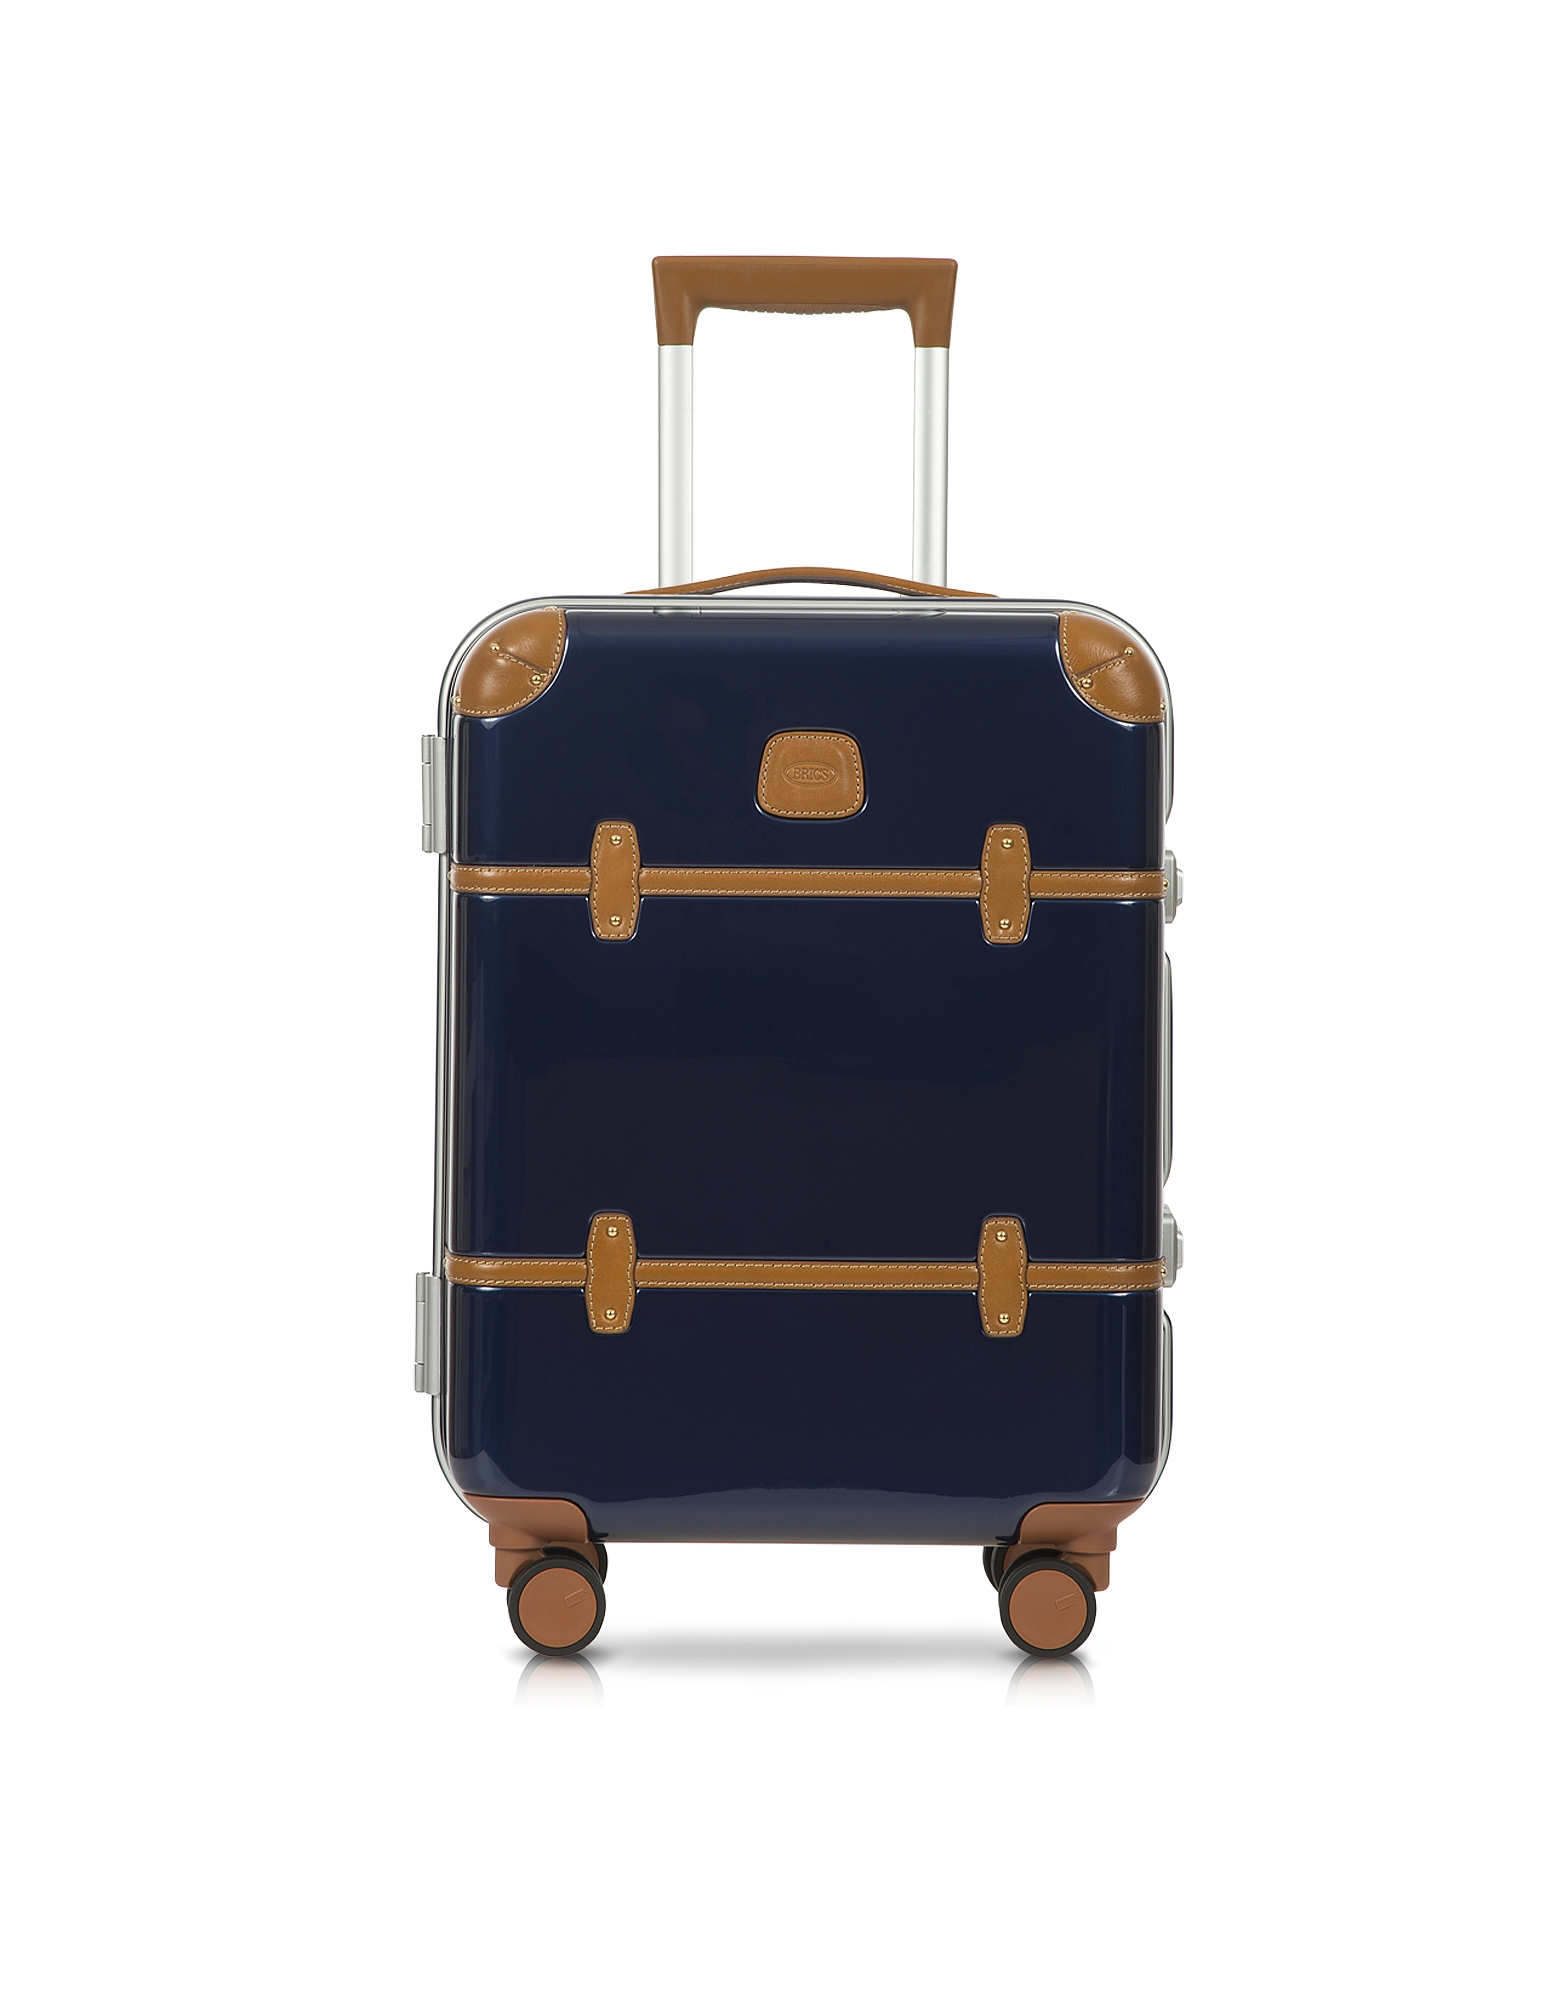 Bellagio Metallo V2.0 - Синий Чемодан Ручная Кладь 21? на Колесиках